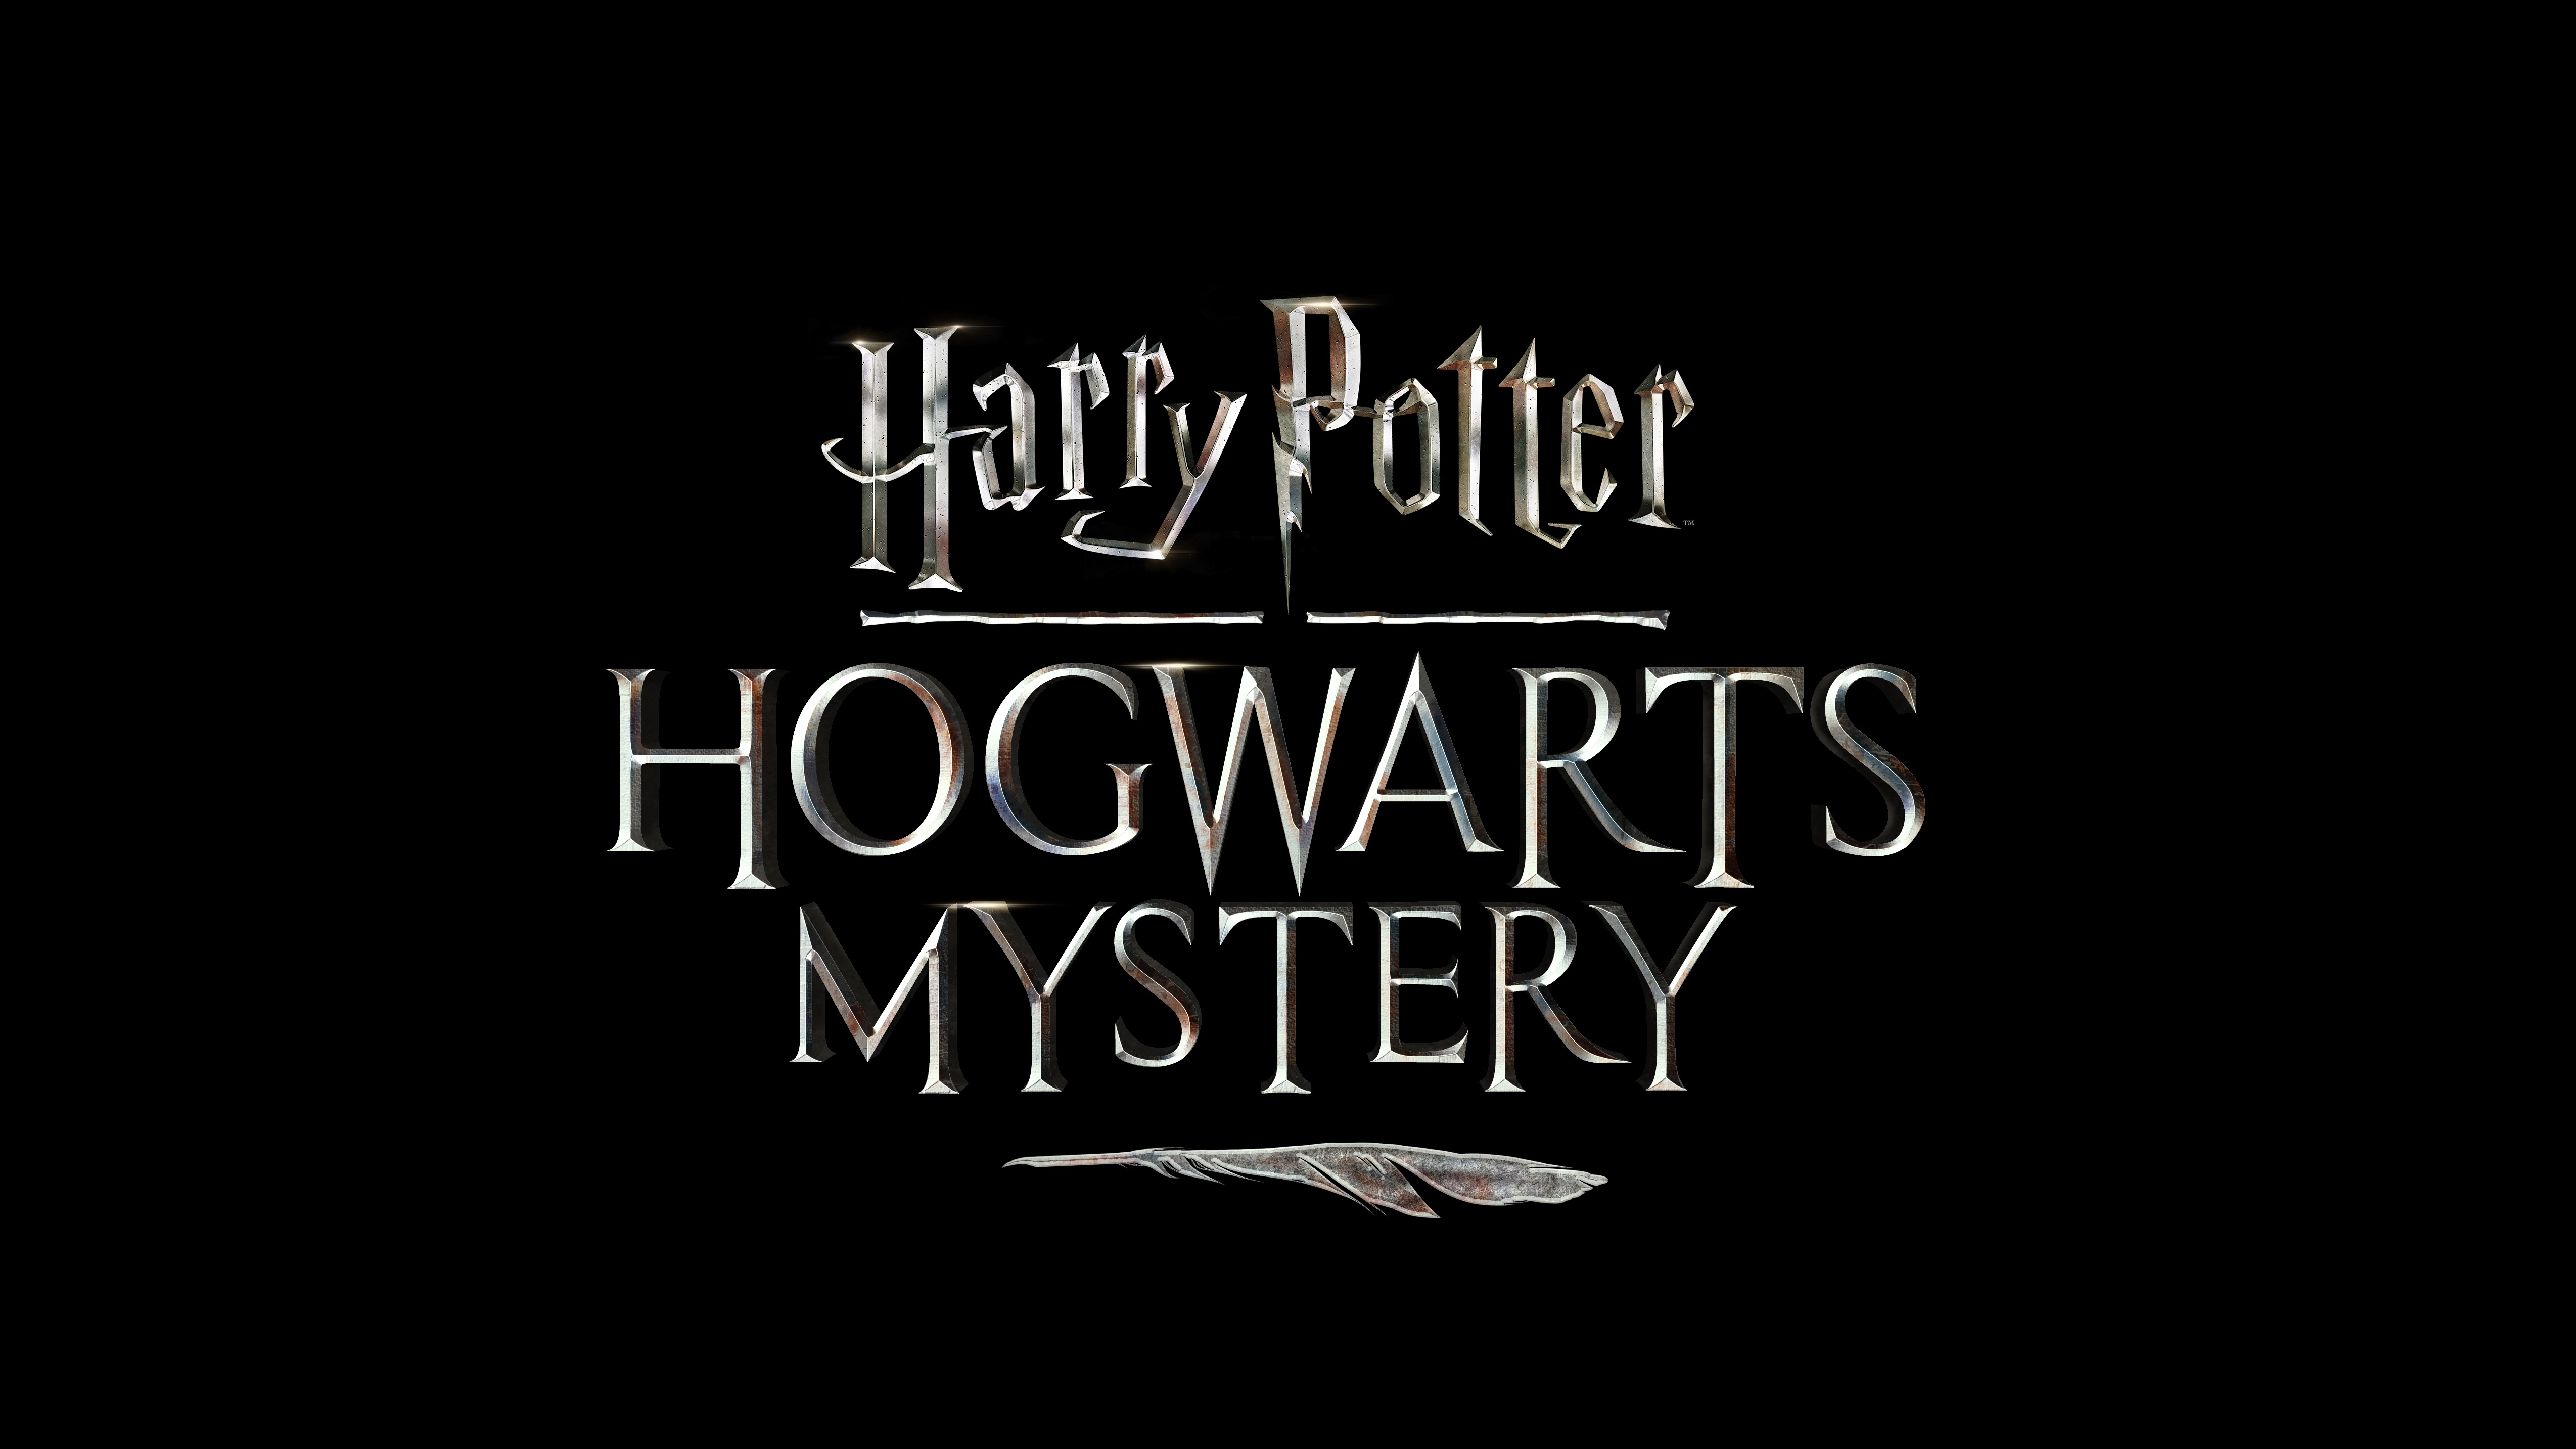 Popular Wallpaper Harry Potter Android - harry-potter-hogwarts-mystery-game-logo-gc  Graphic_245232.jpg